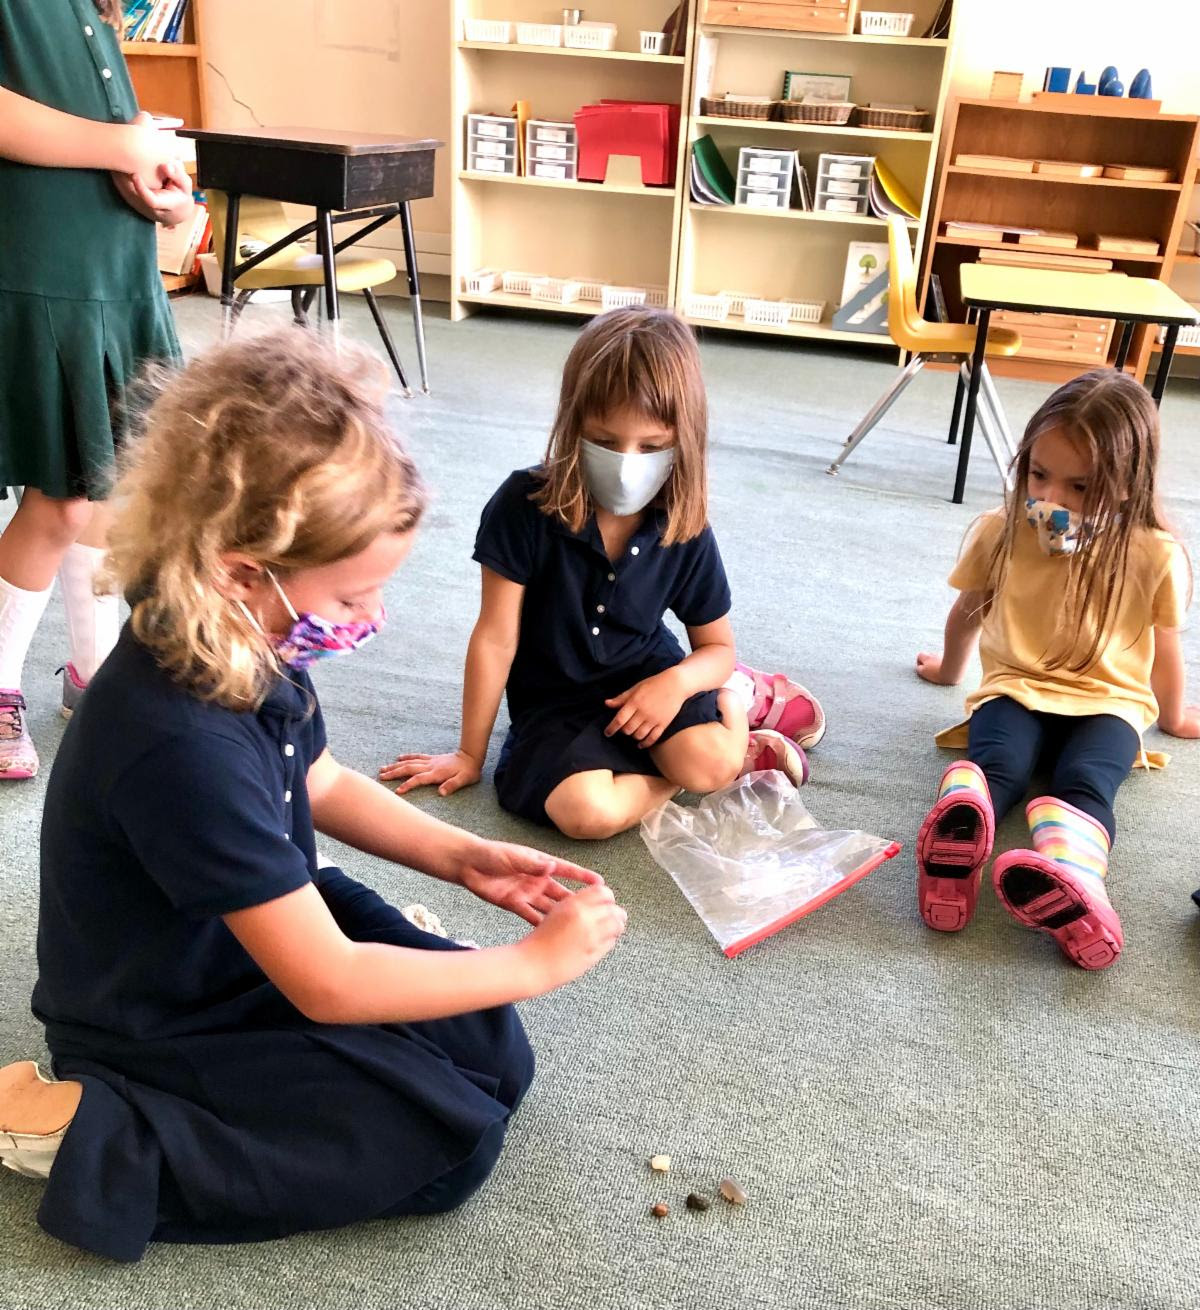 montessori in elementary school